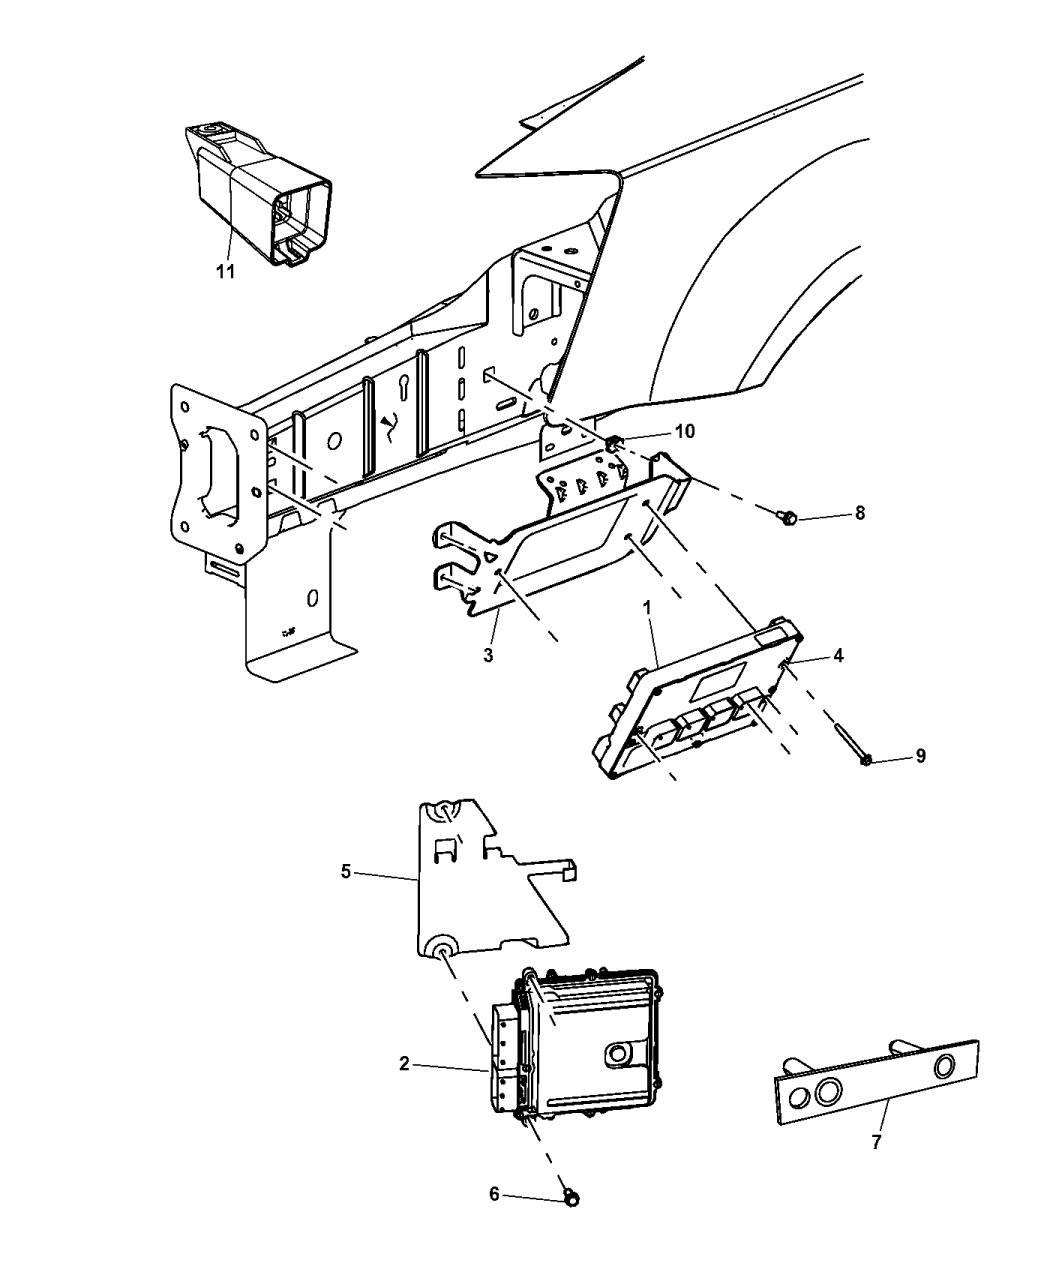 2014 Dodge Grand Caravan Modules Engine Compartment